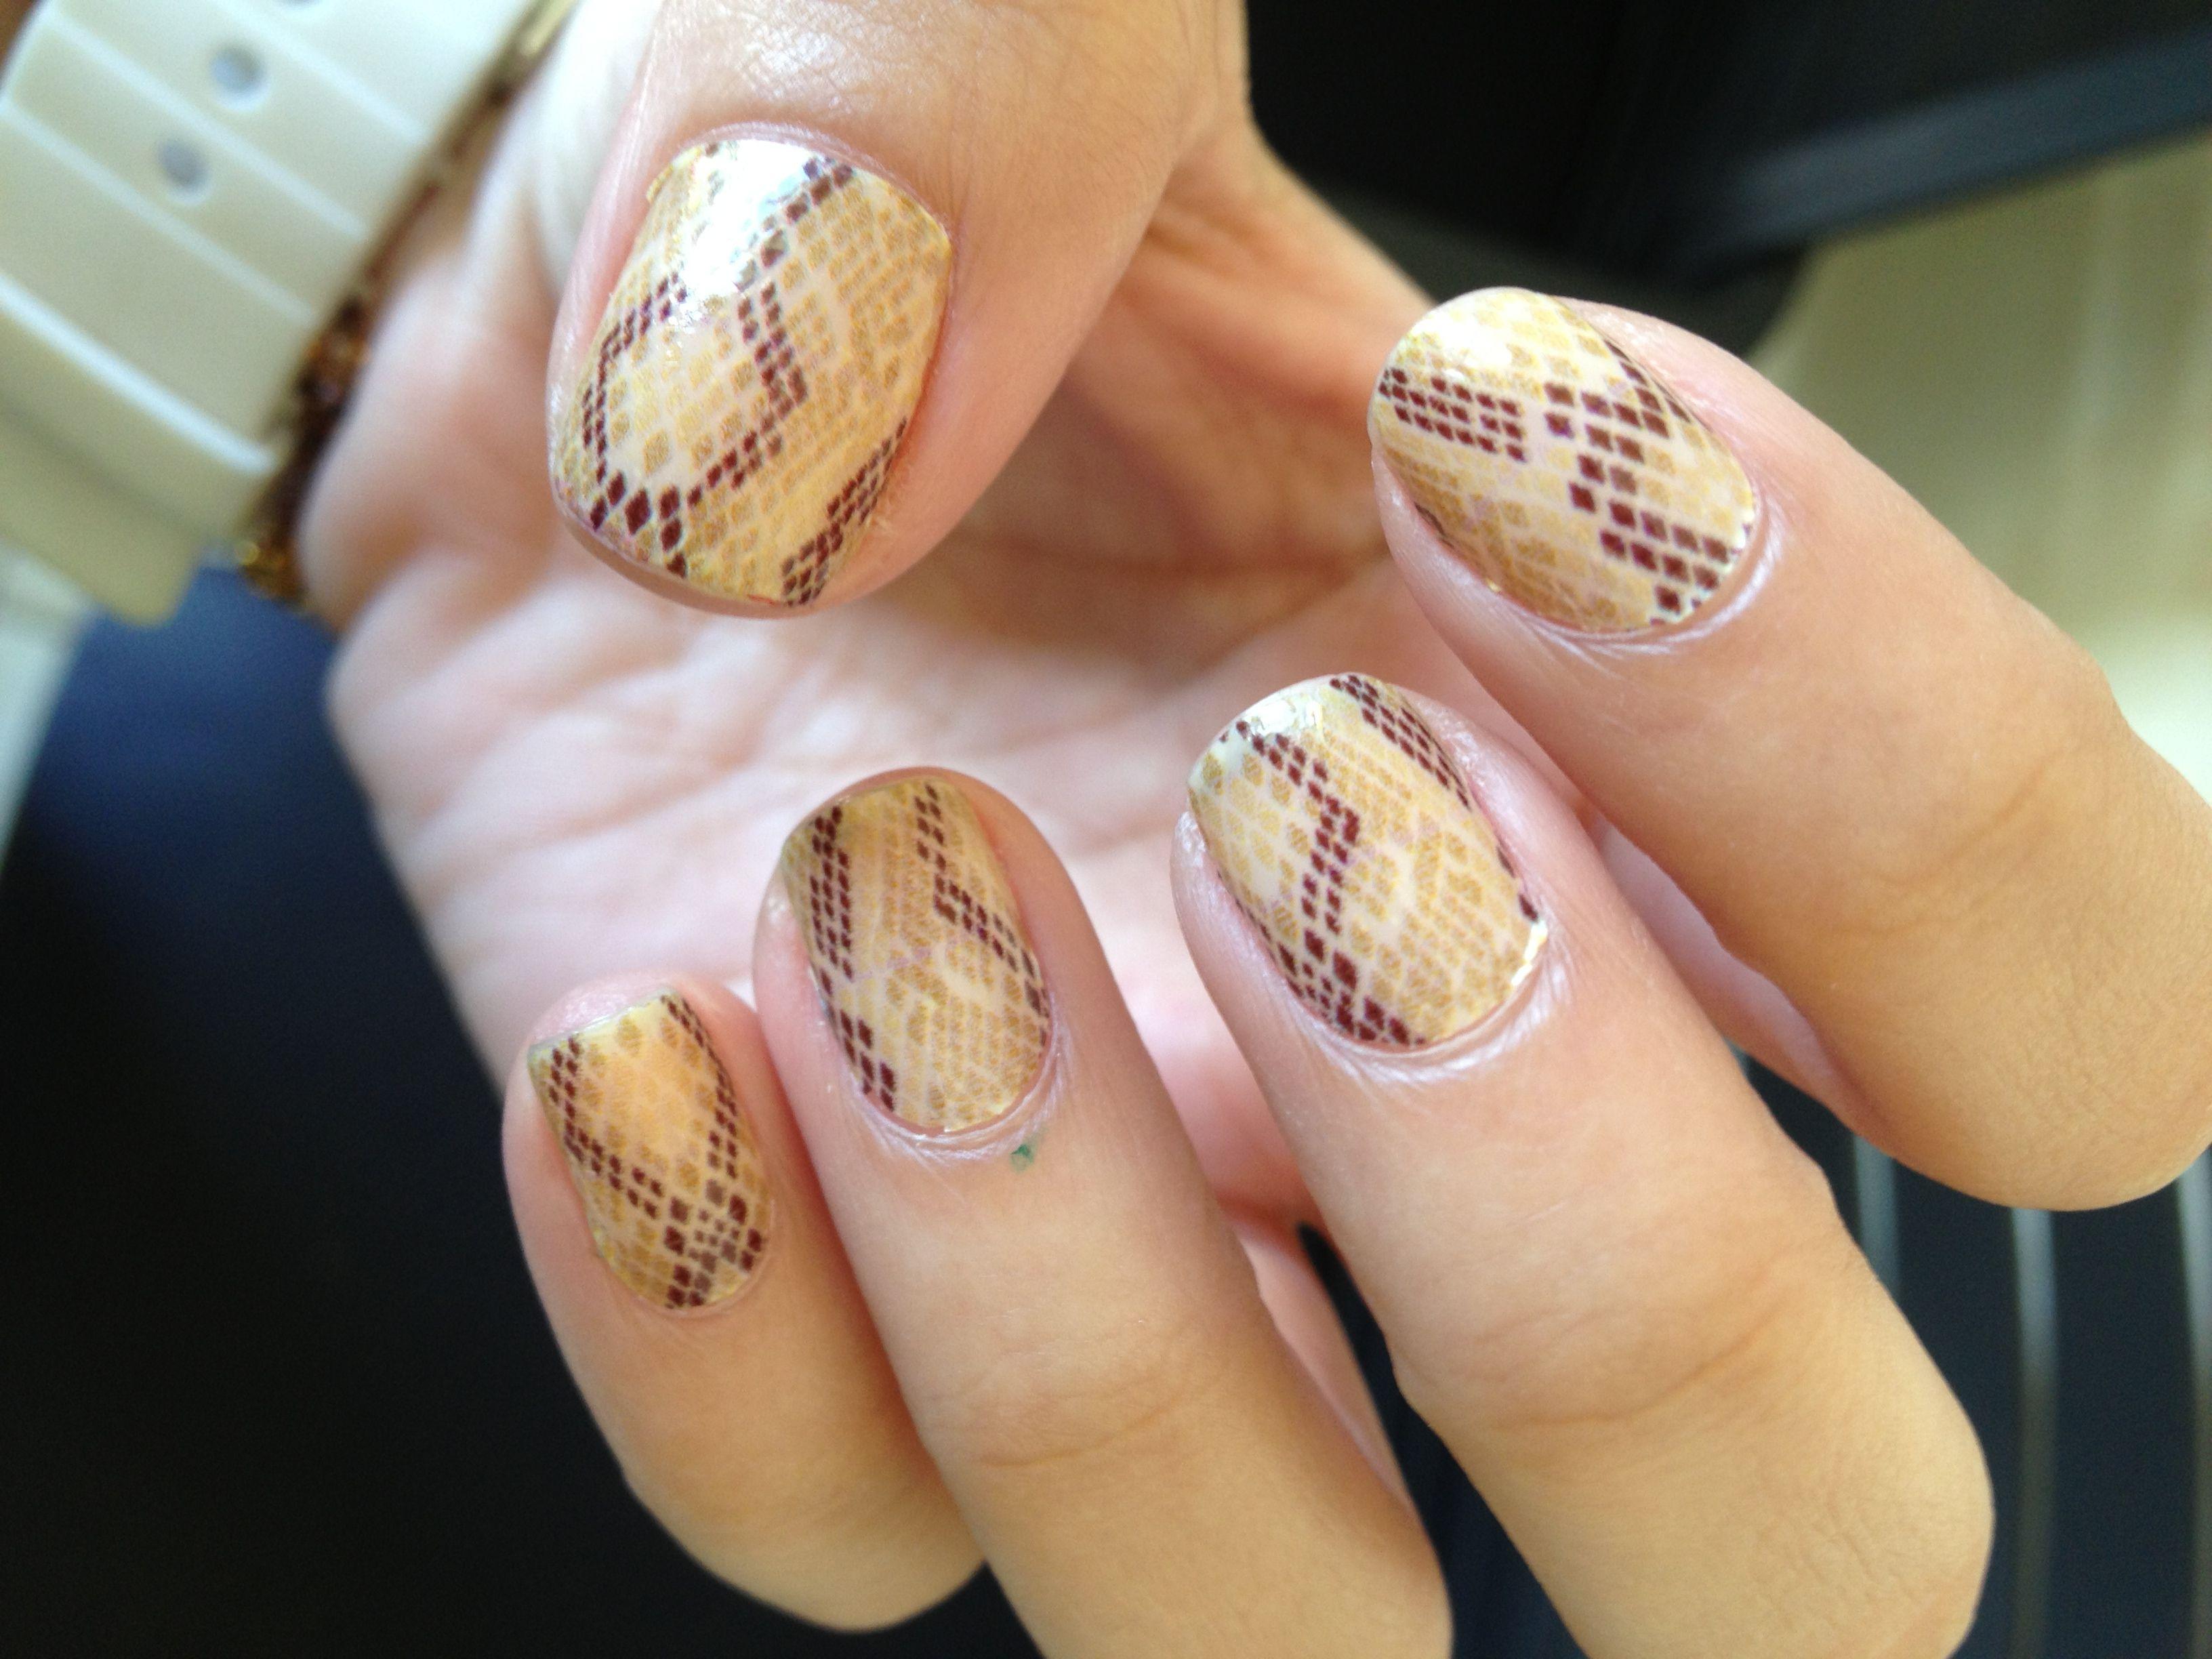 My sticker nail polish by Sally Hansen Salon Effects. Brattlesnake ...